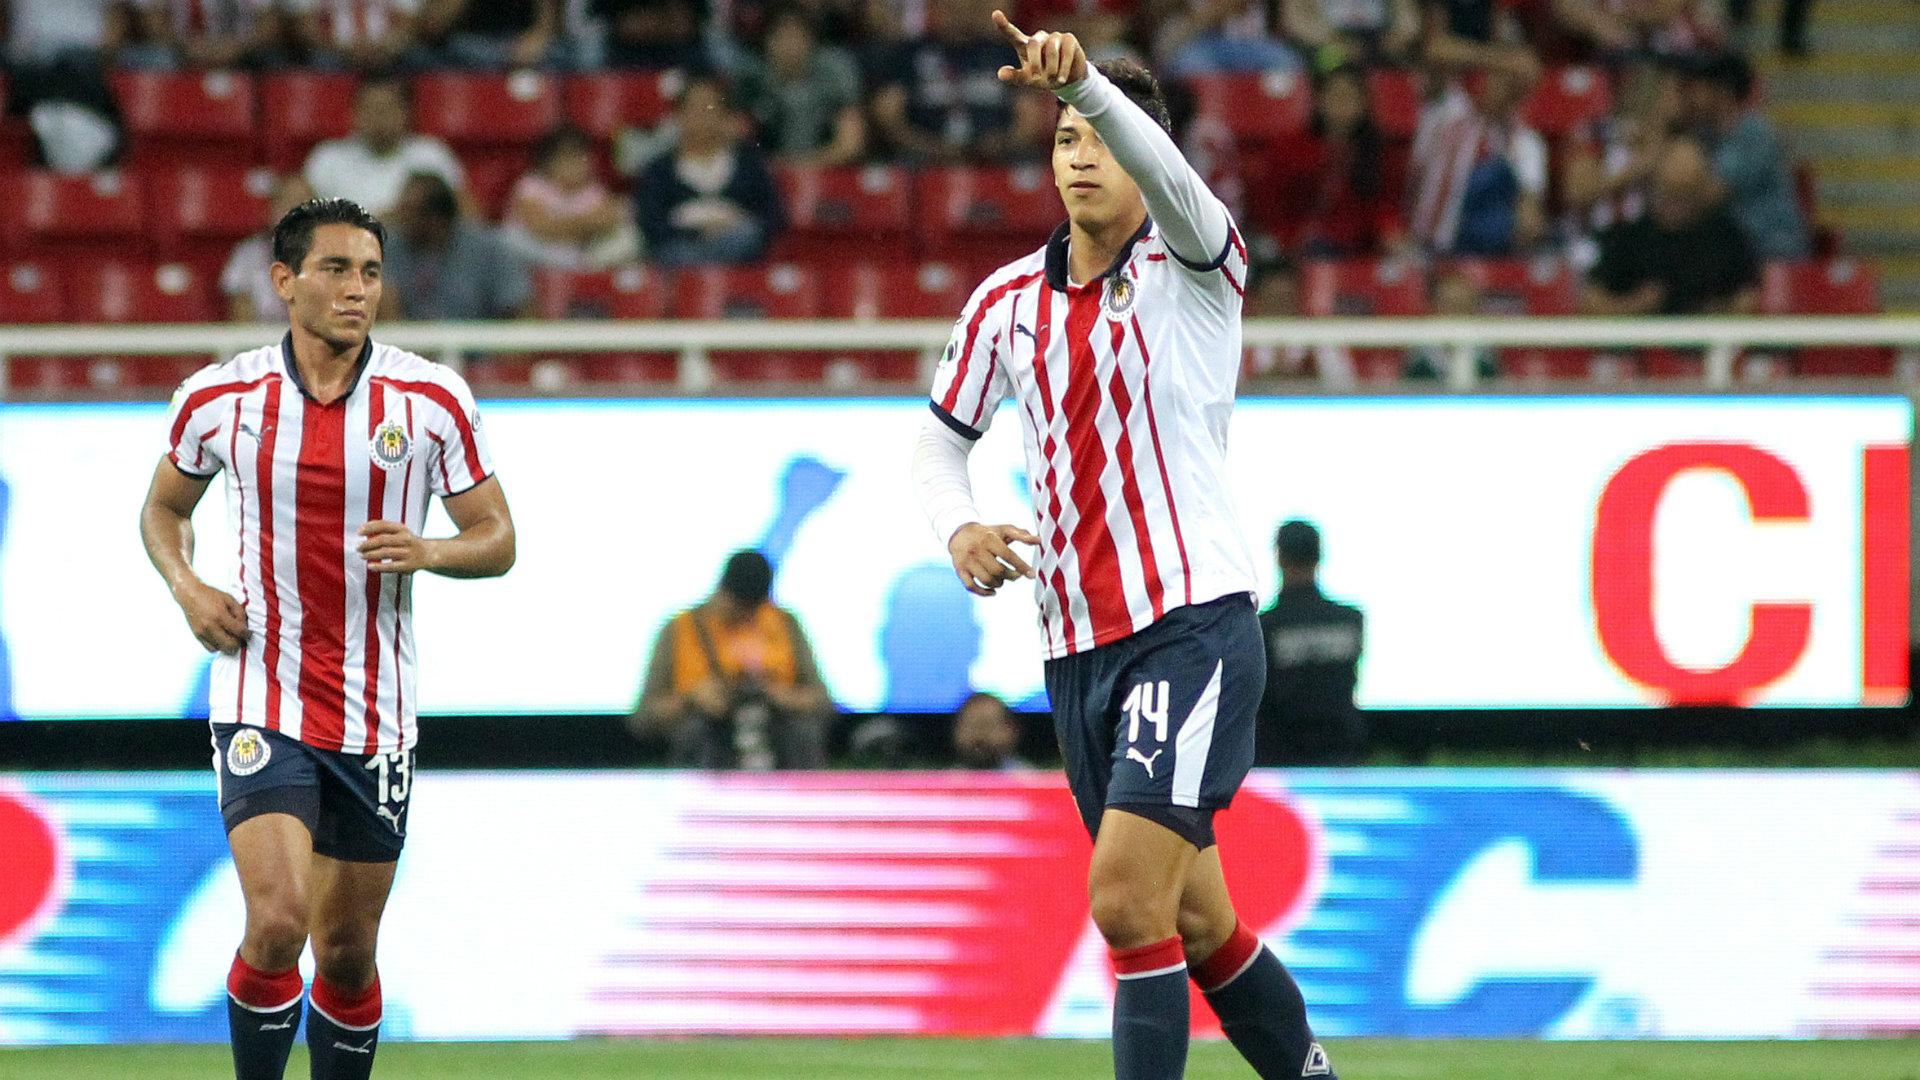 Zaldívar Liga MX Chivas Apertura 2018